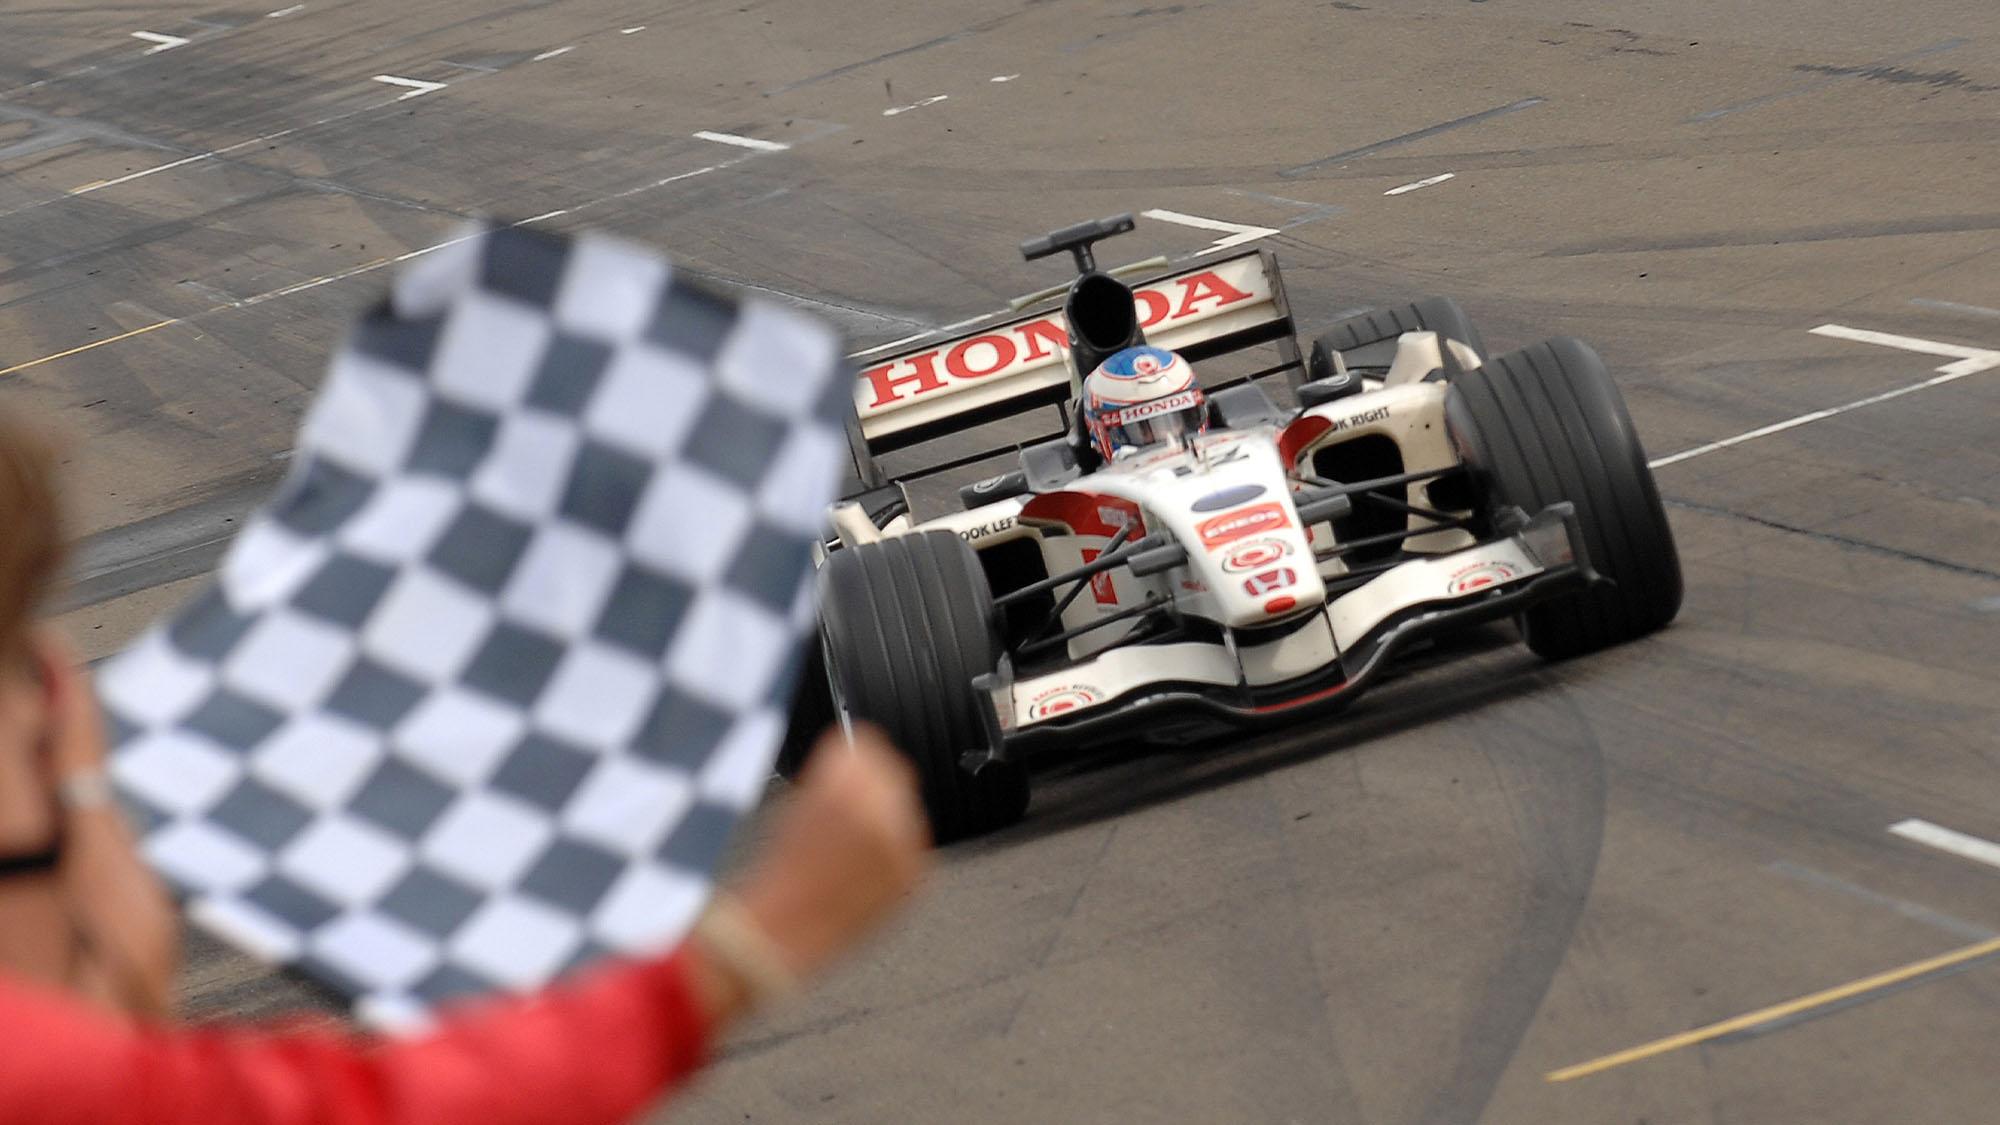 2006 Hungarian GP Jenson Button